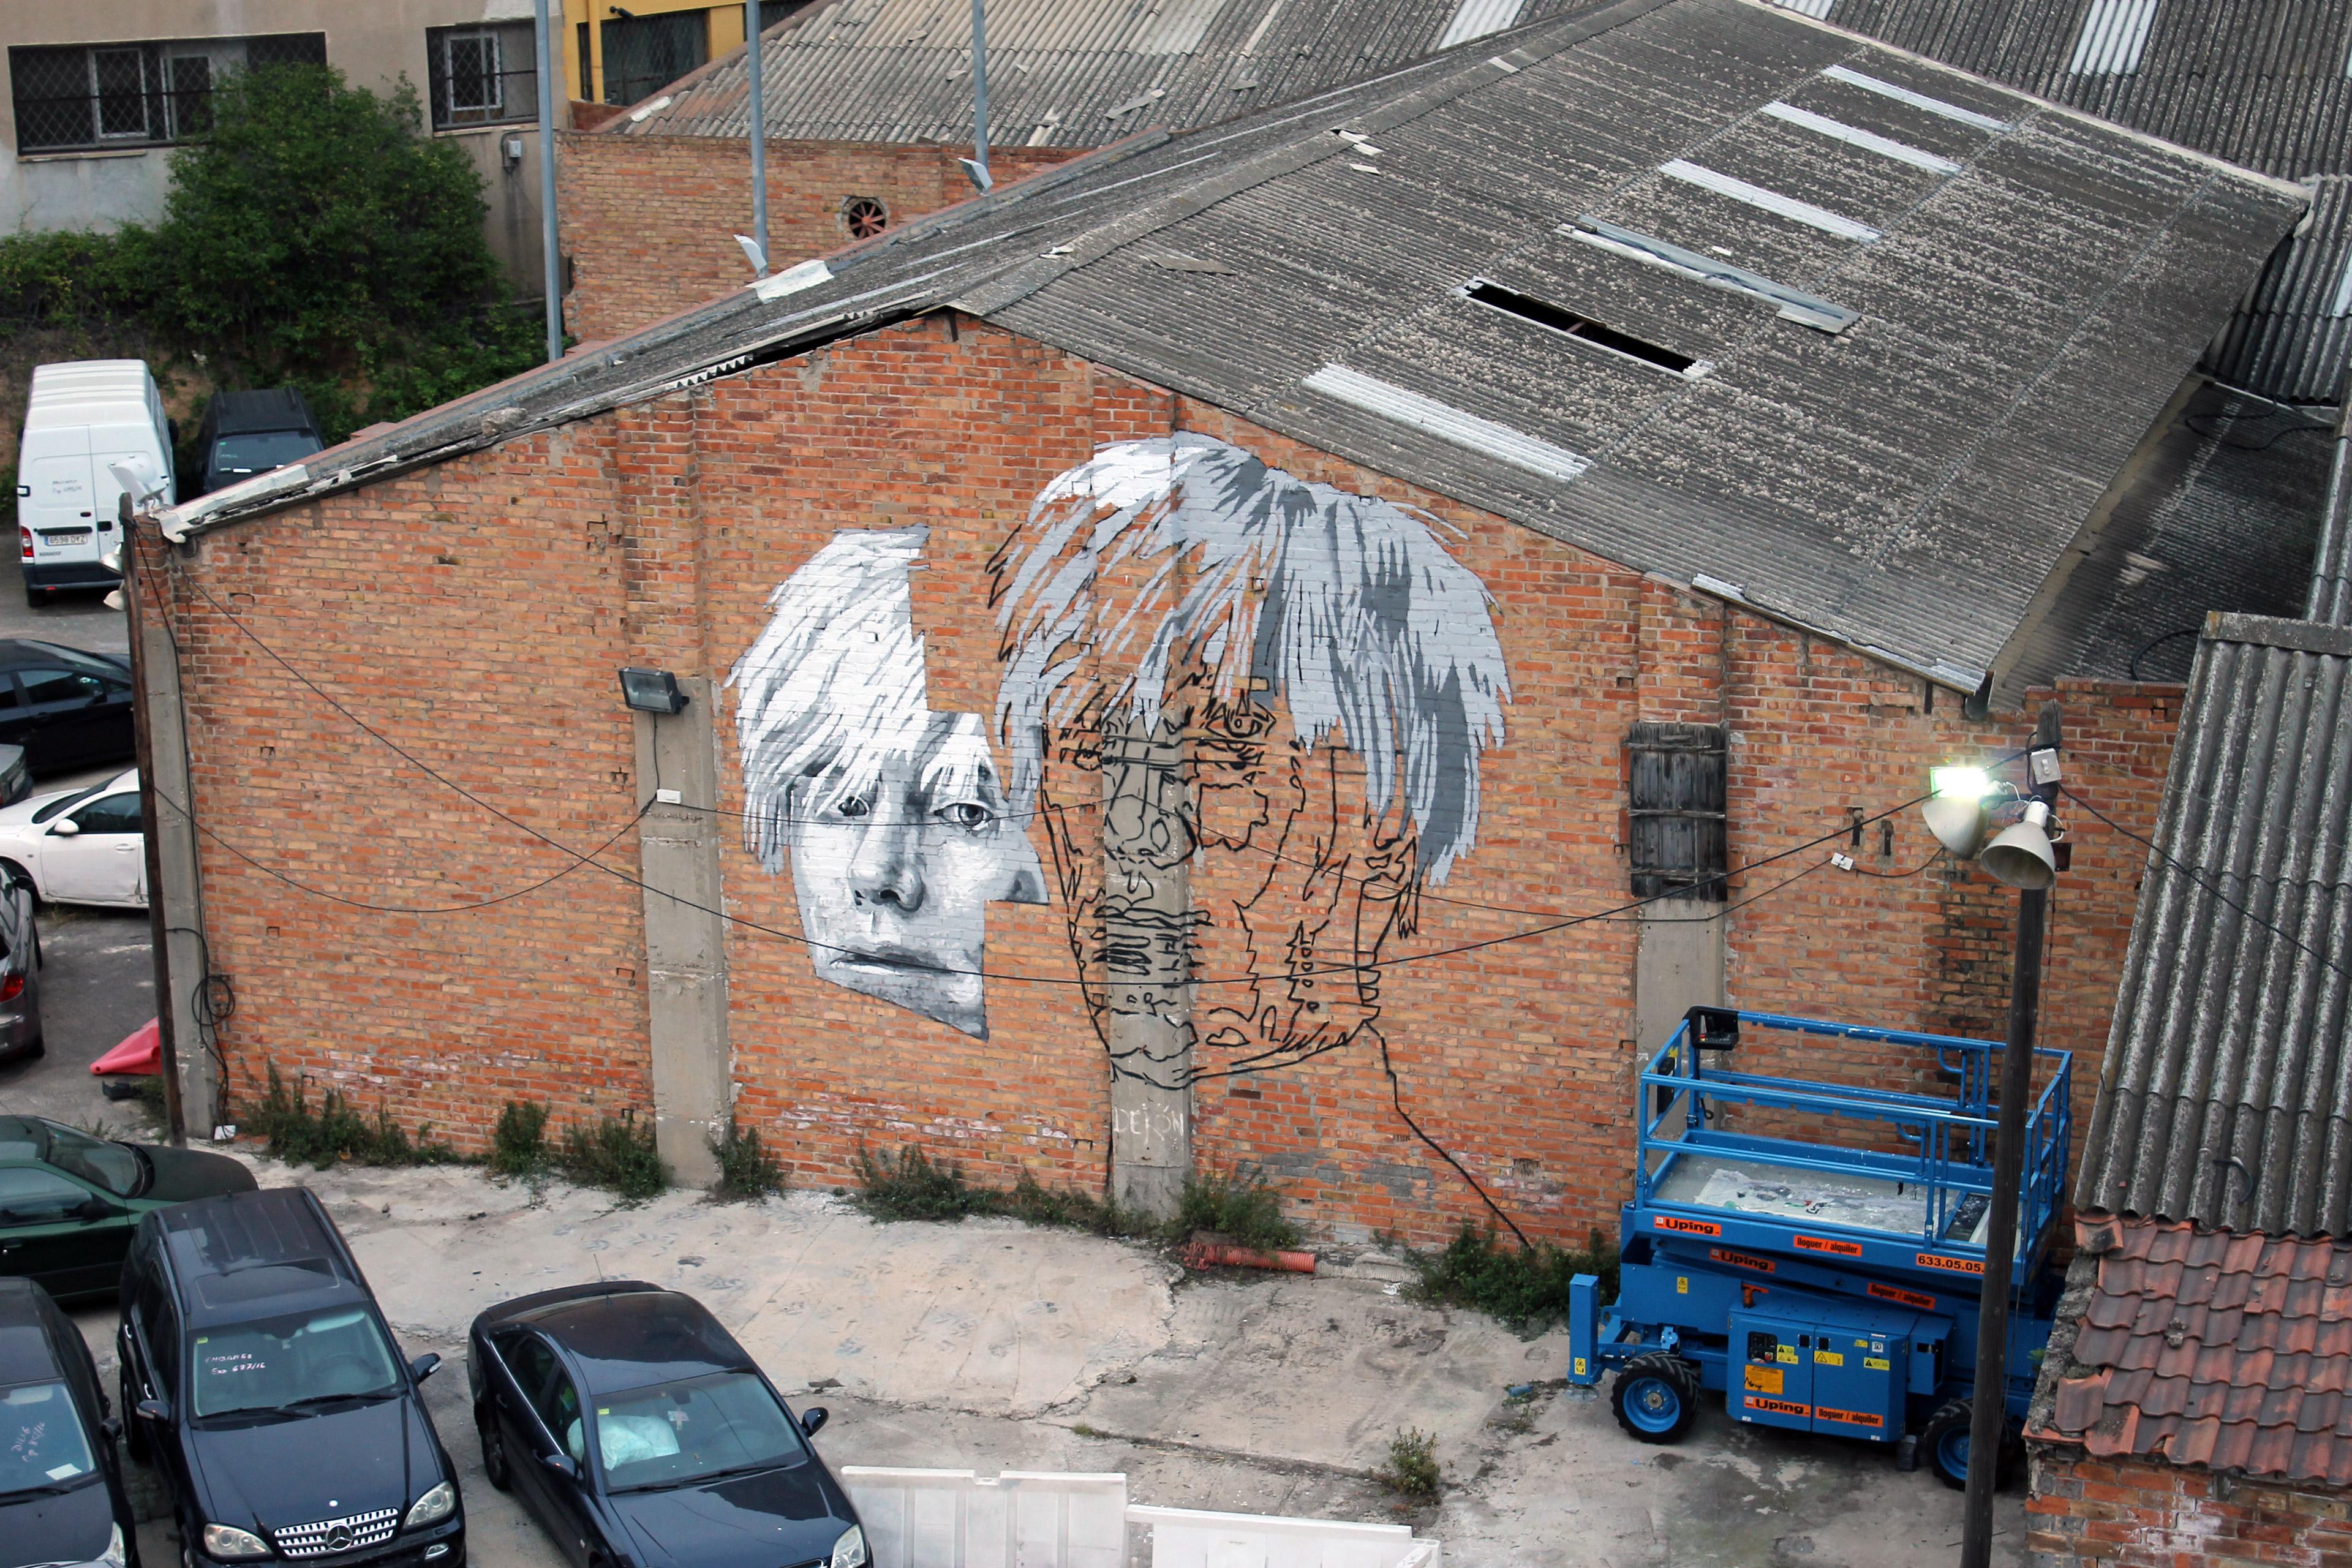 Andy Warhol Mural